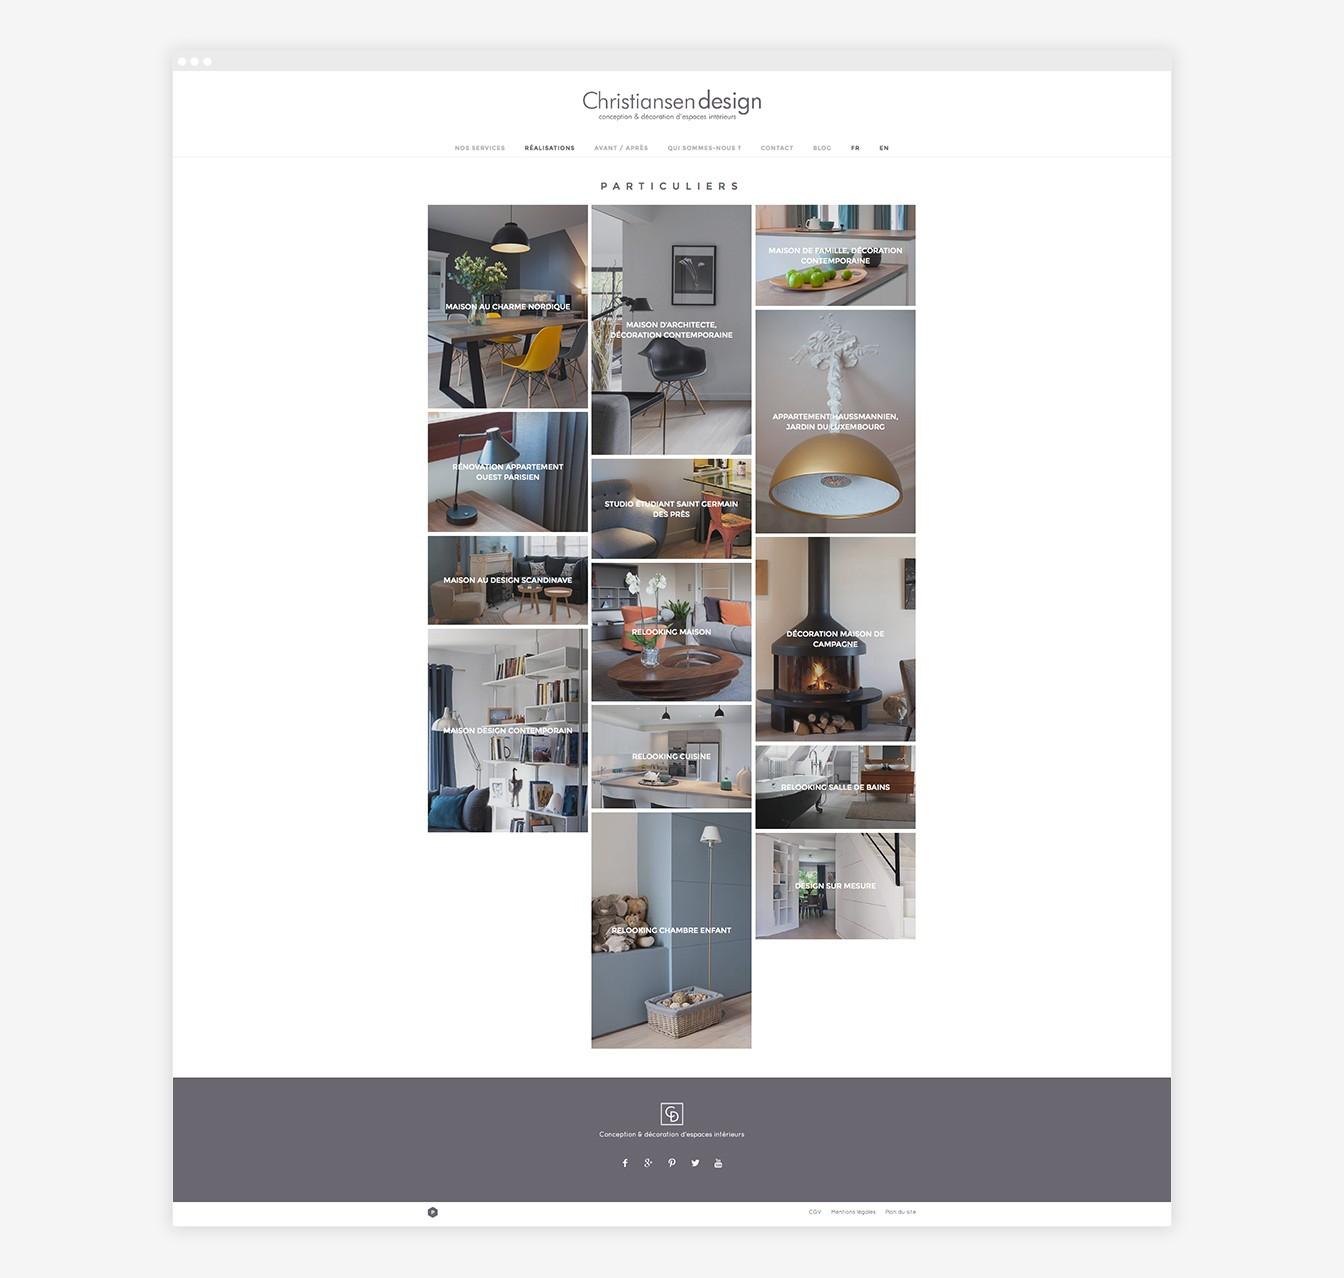 christiansen-design-2016-web-03-details-pikteo-webdesign-graphic-design-freelance-paris-bruxelles-lyon